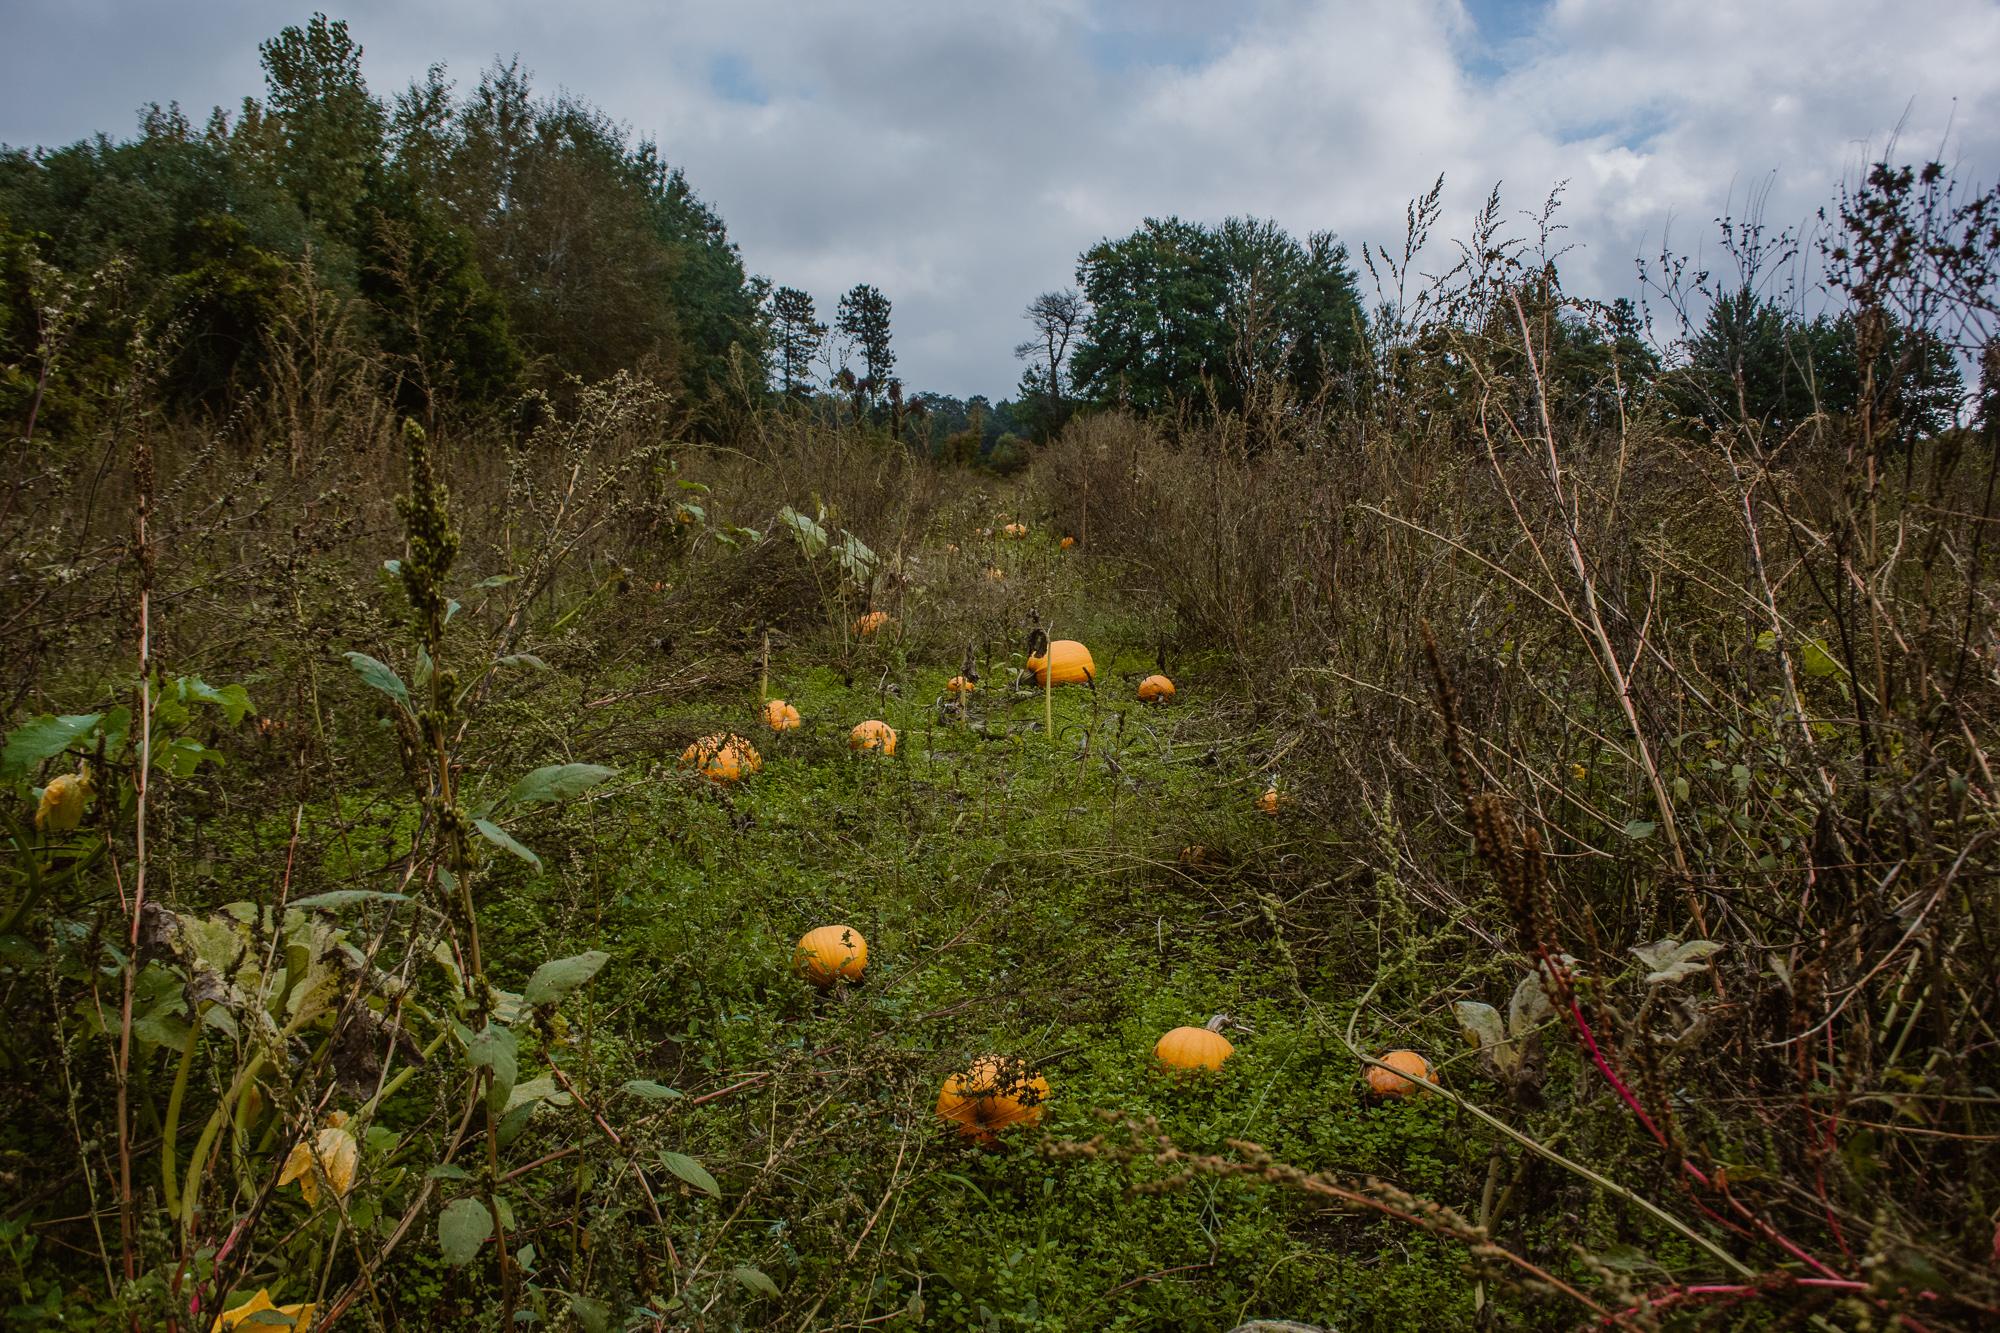 bethke-farms-pumpkin-patch-grand-haven-michigan (1).jpg